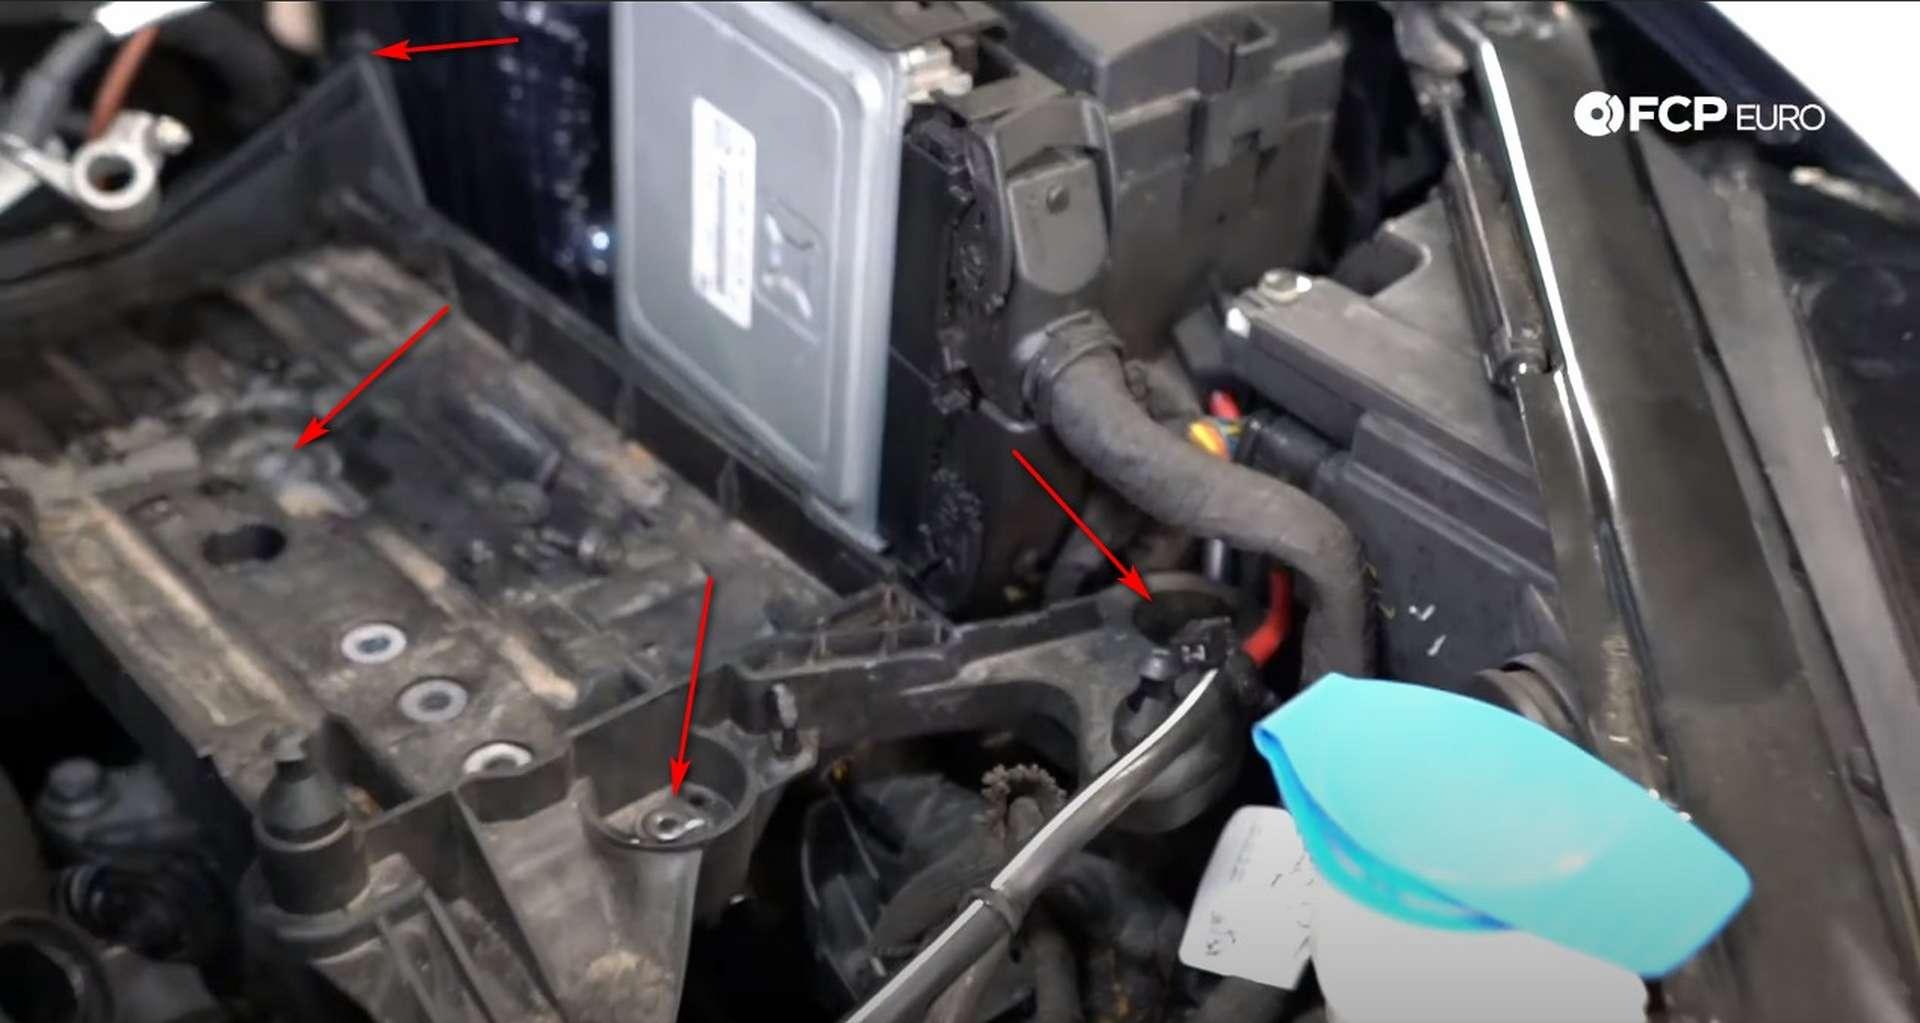 05-DIY_VW_GTI_Clutch-Job-Removing-Battery